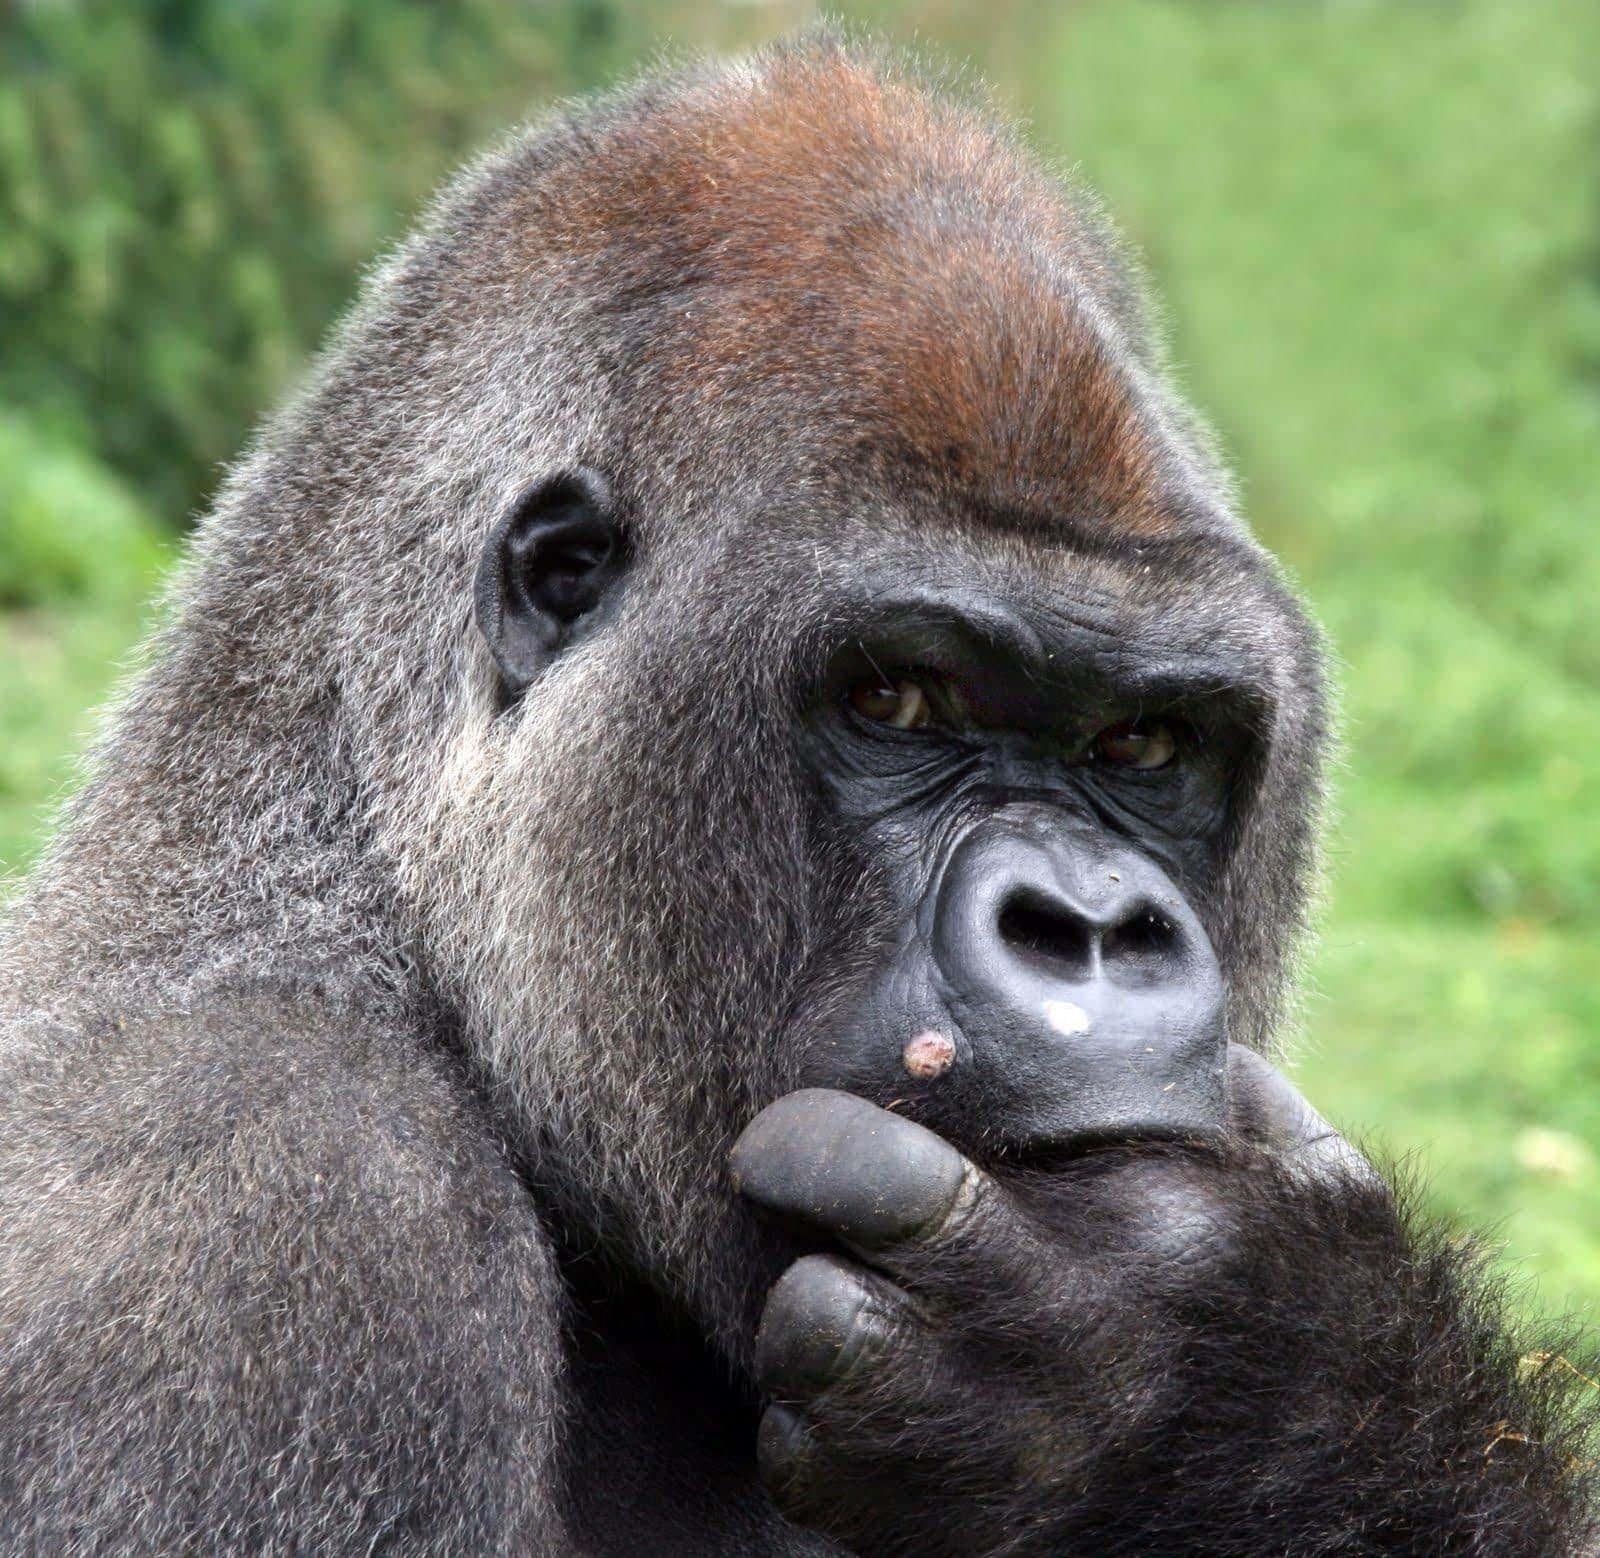 Gorilla dream meaning, seeing in a dream gorilla, dream about gorilla